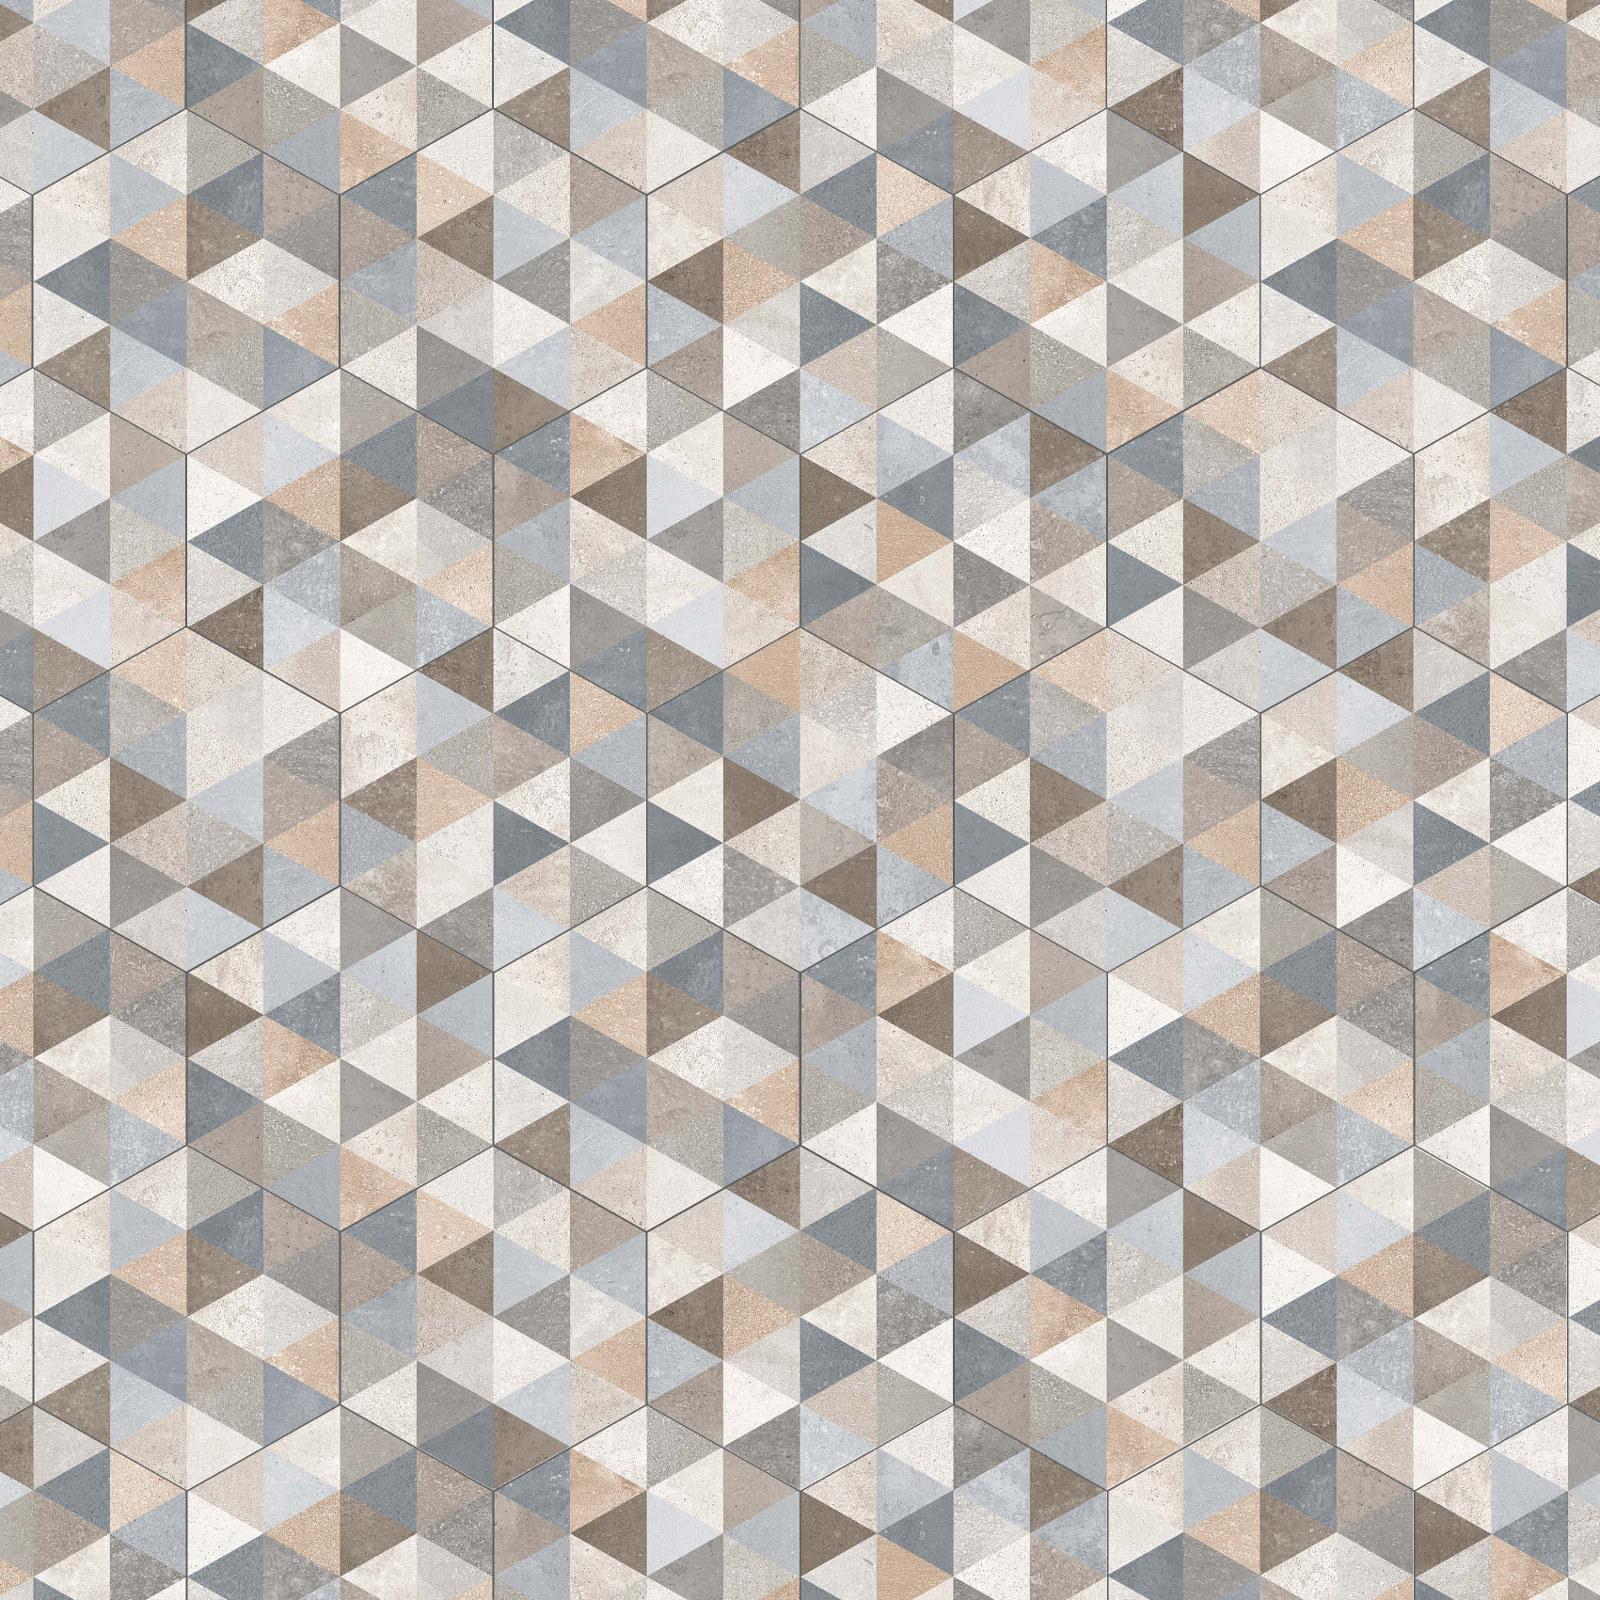 Floor Tiles Porcelain Rift 23x26 6 Vives Azulejos Y Gres